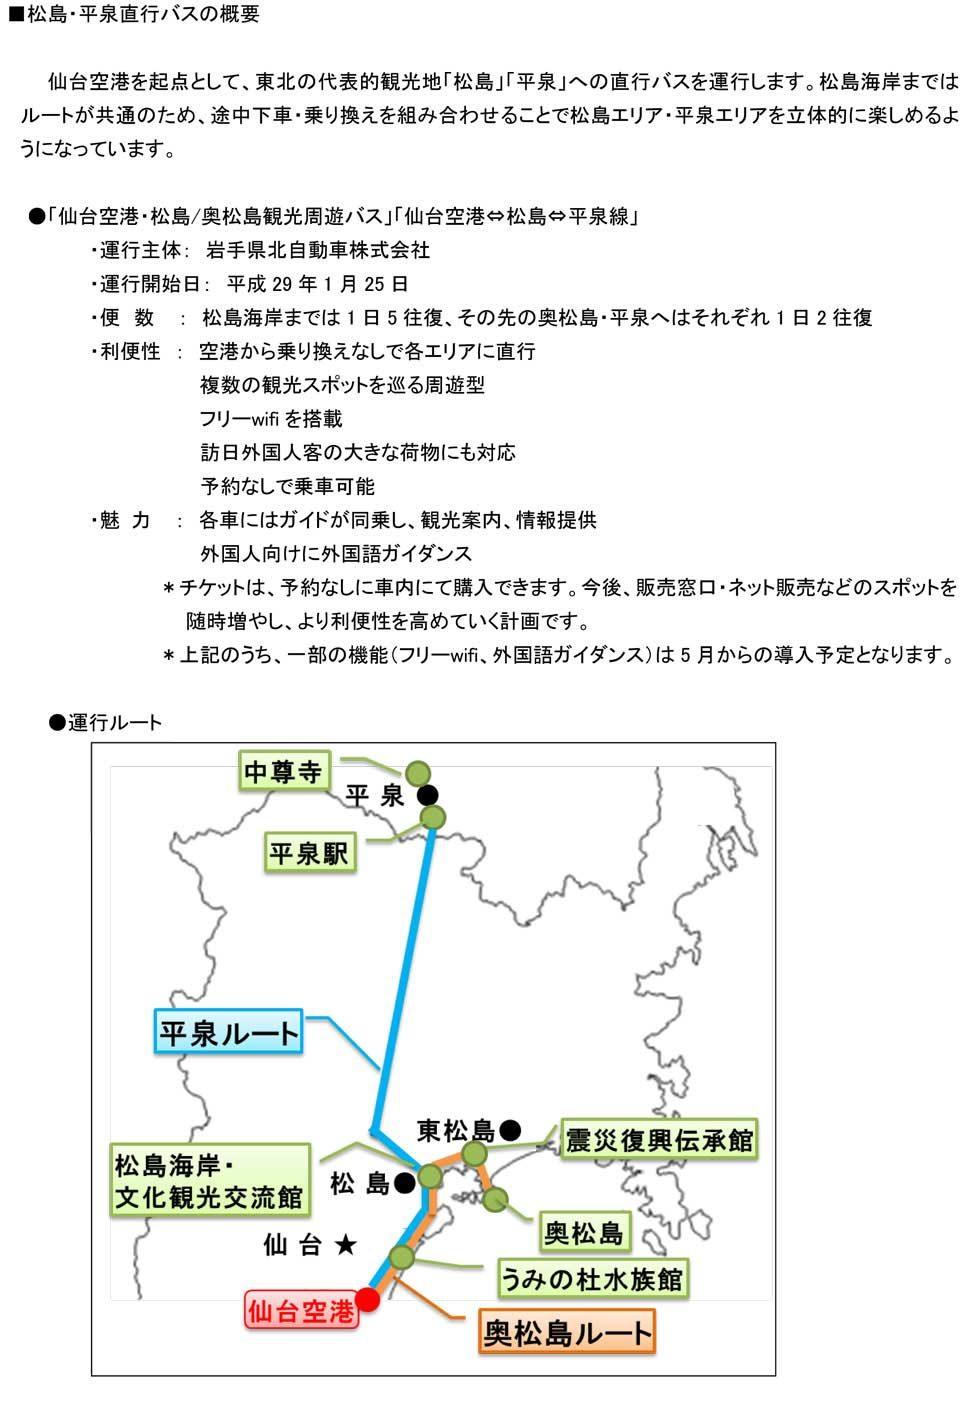 20170126hiraizumibusosusume1